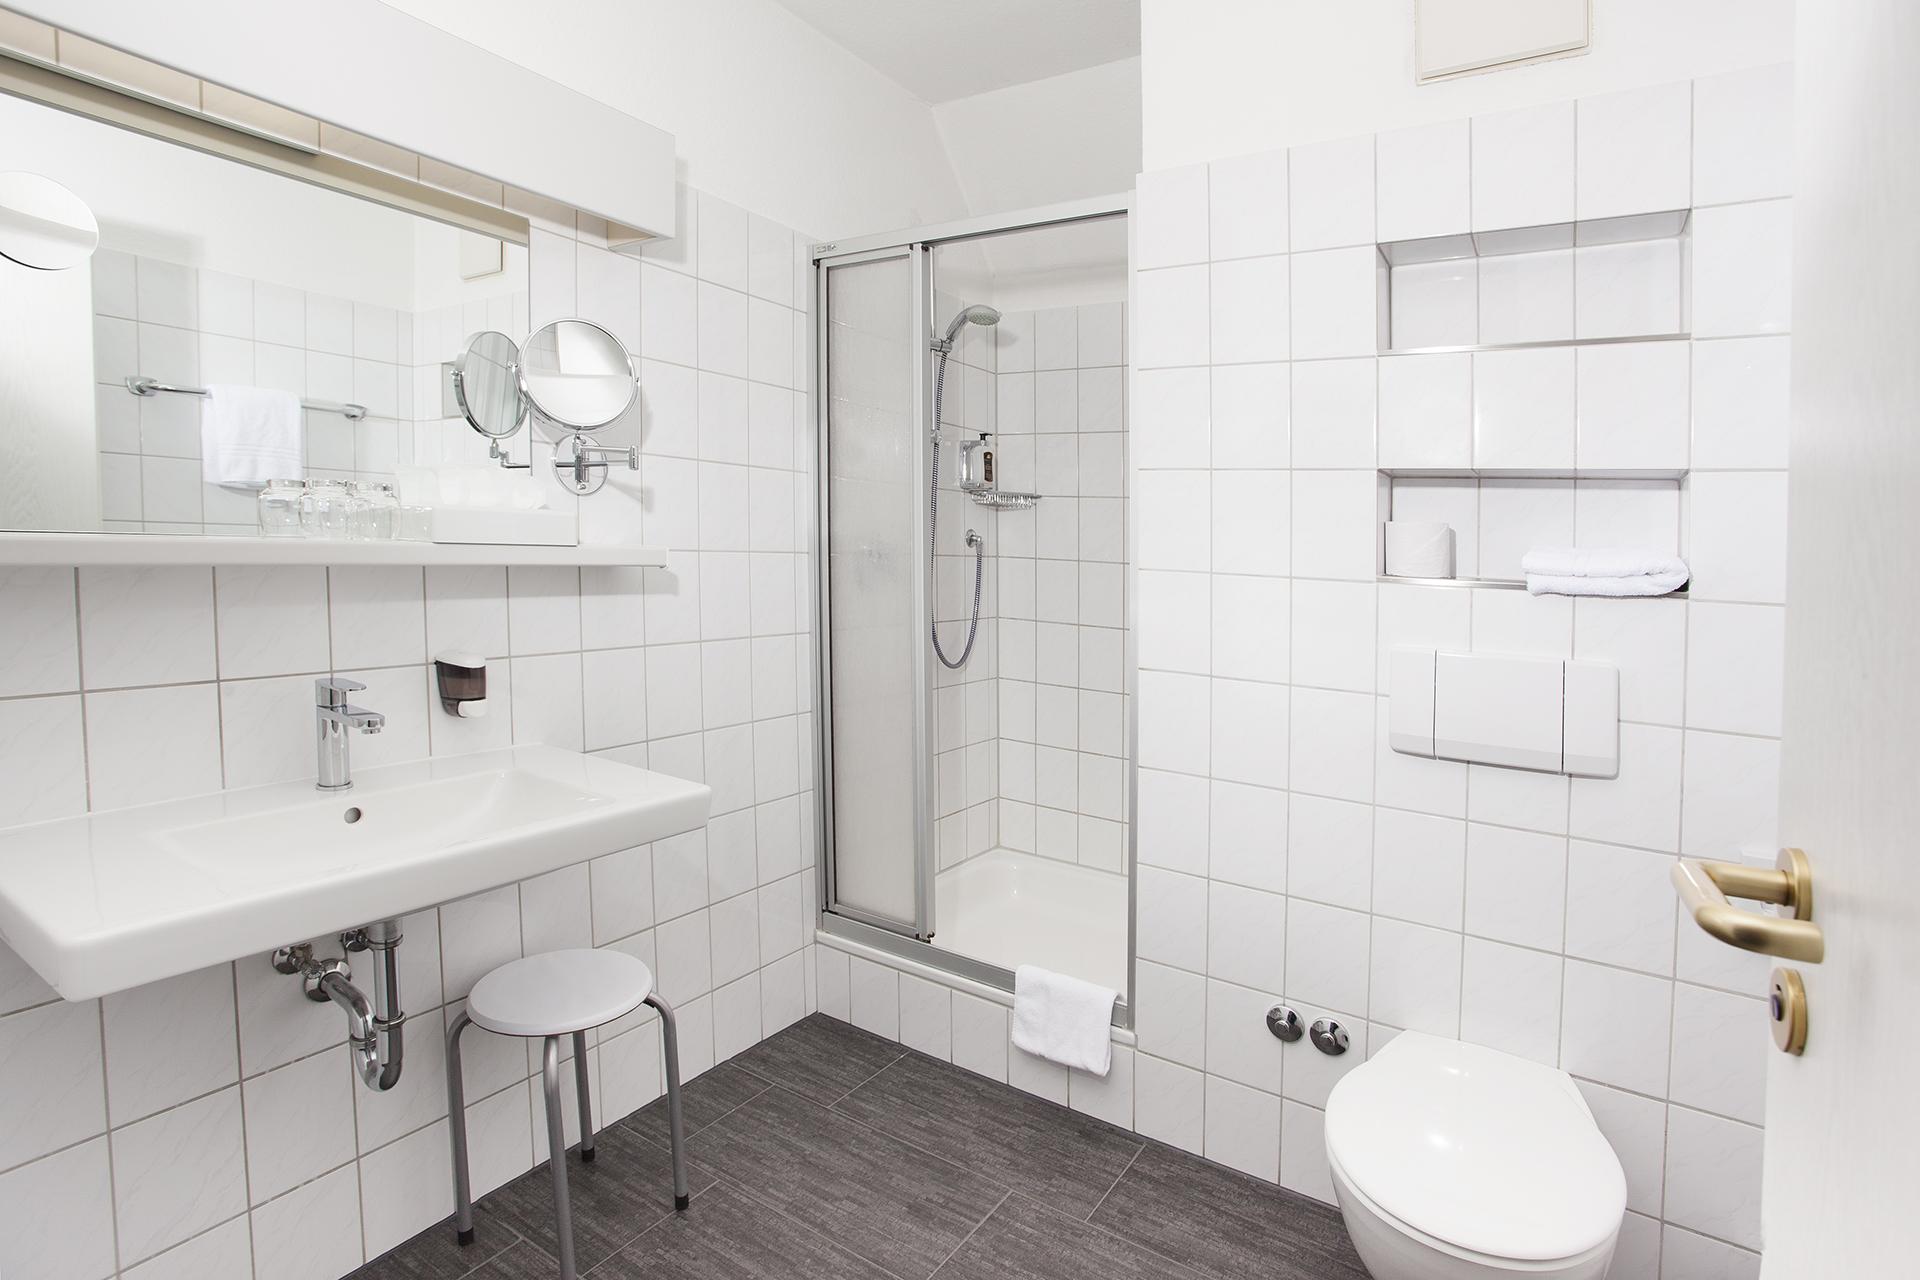 Berufsfotografin-Liesa-Flemming-Hotel-Kämper-09